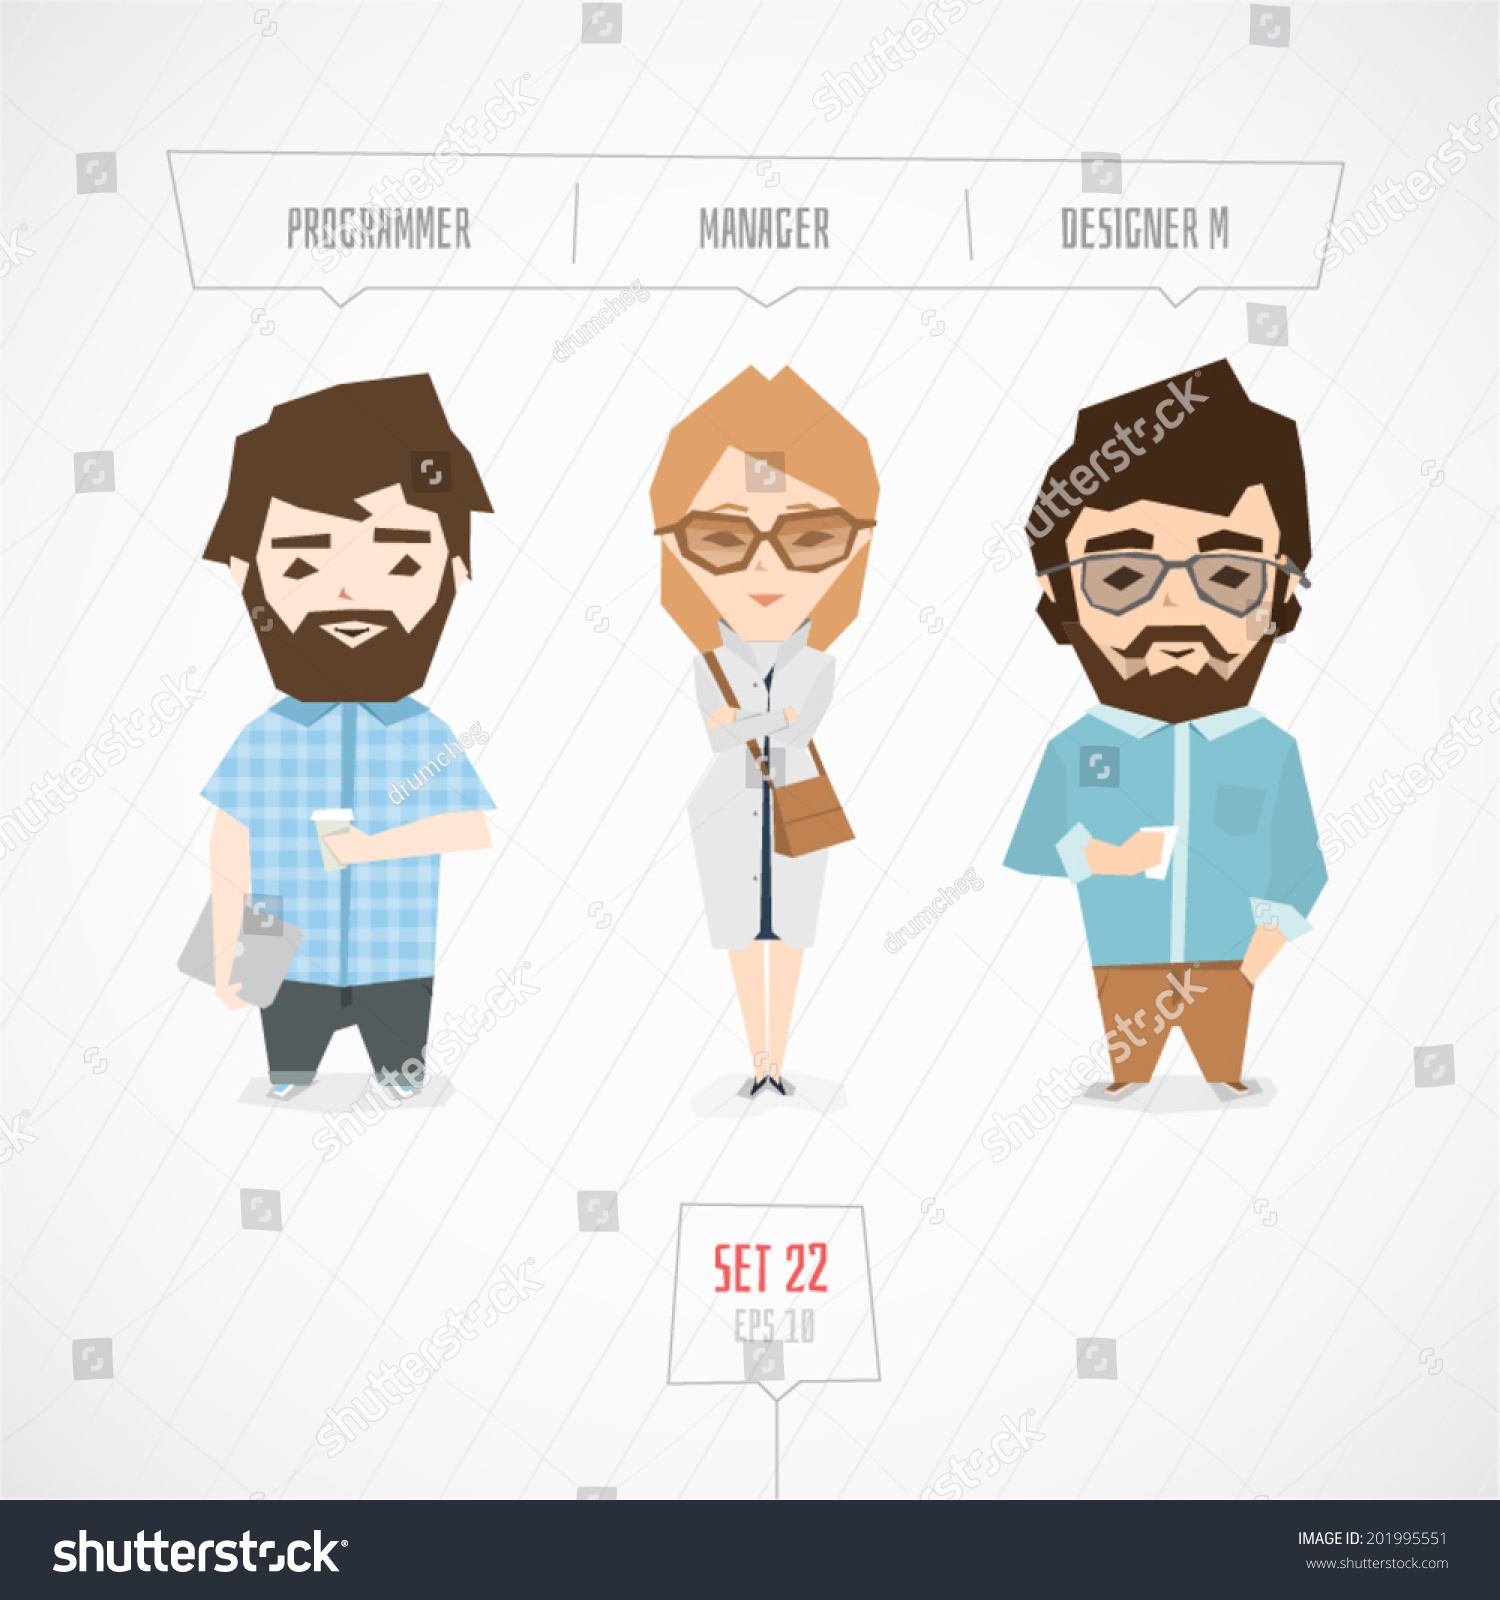 Cartoon Character Design Illustrator : Cartoon characters programmer manager designer vector